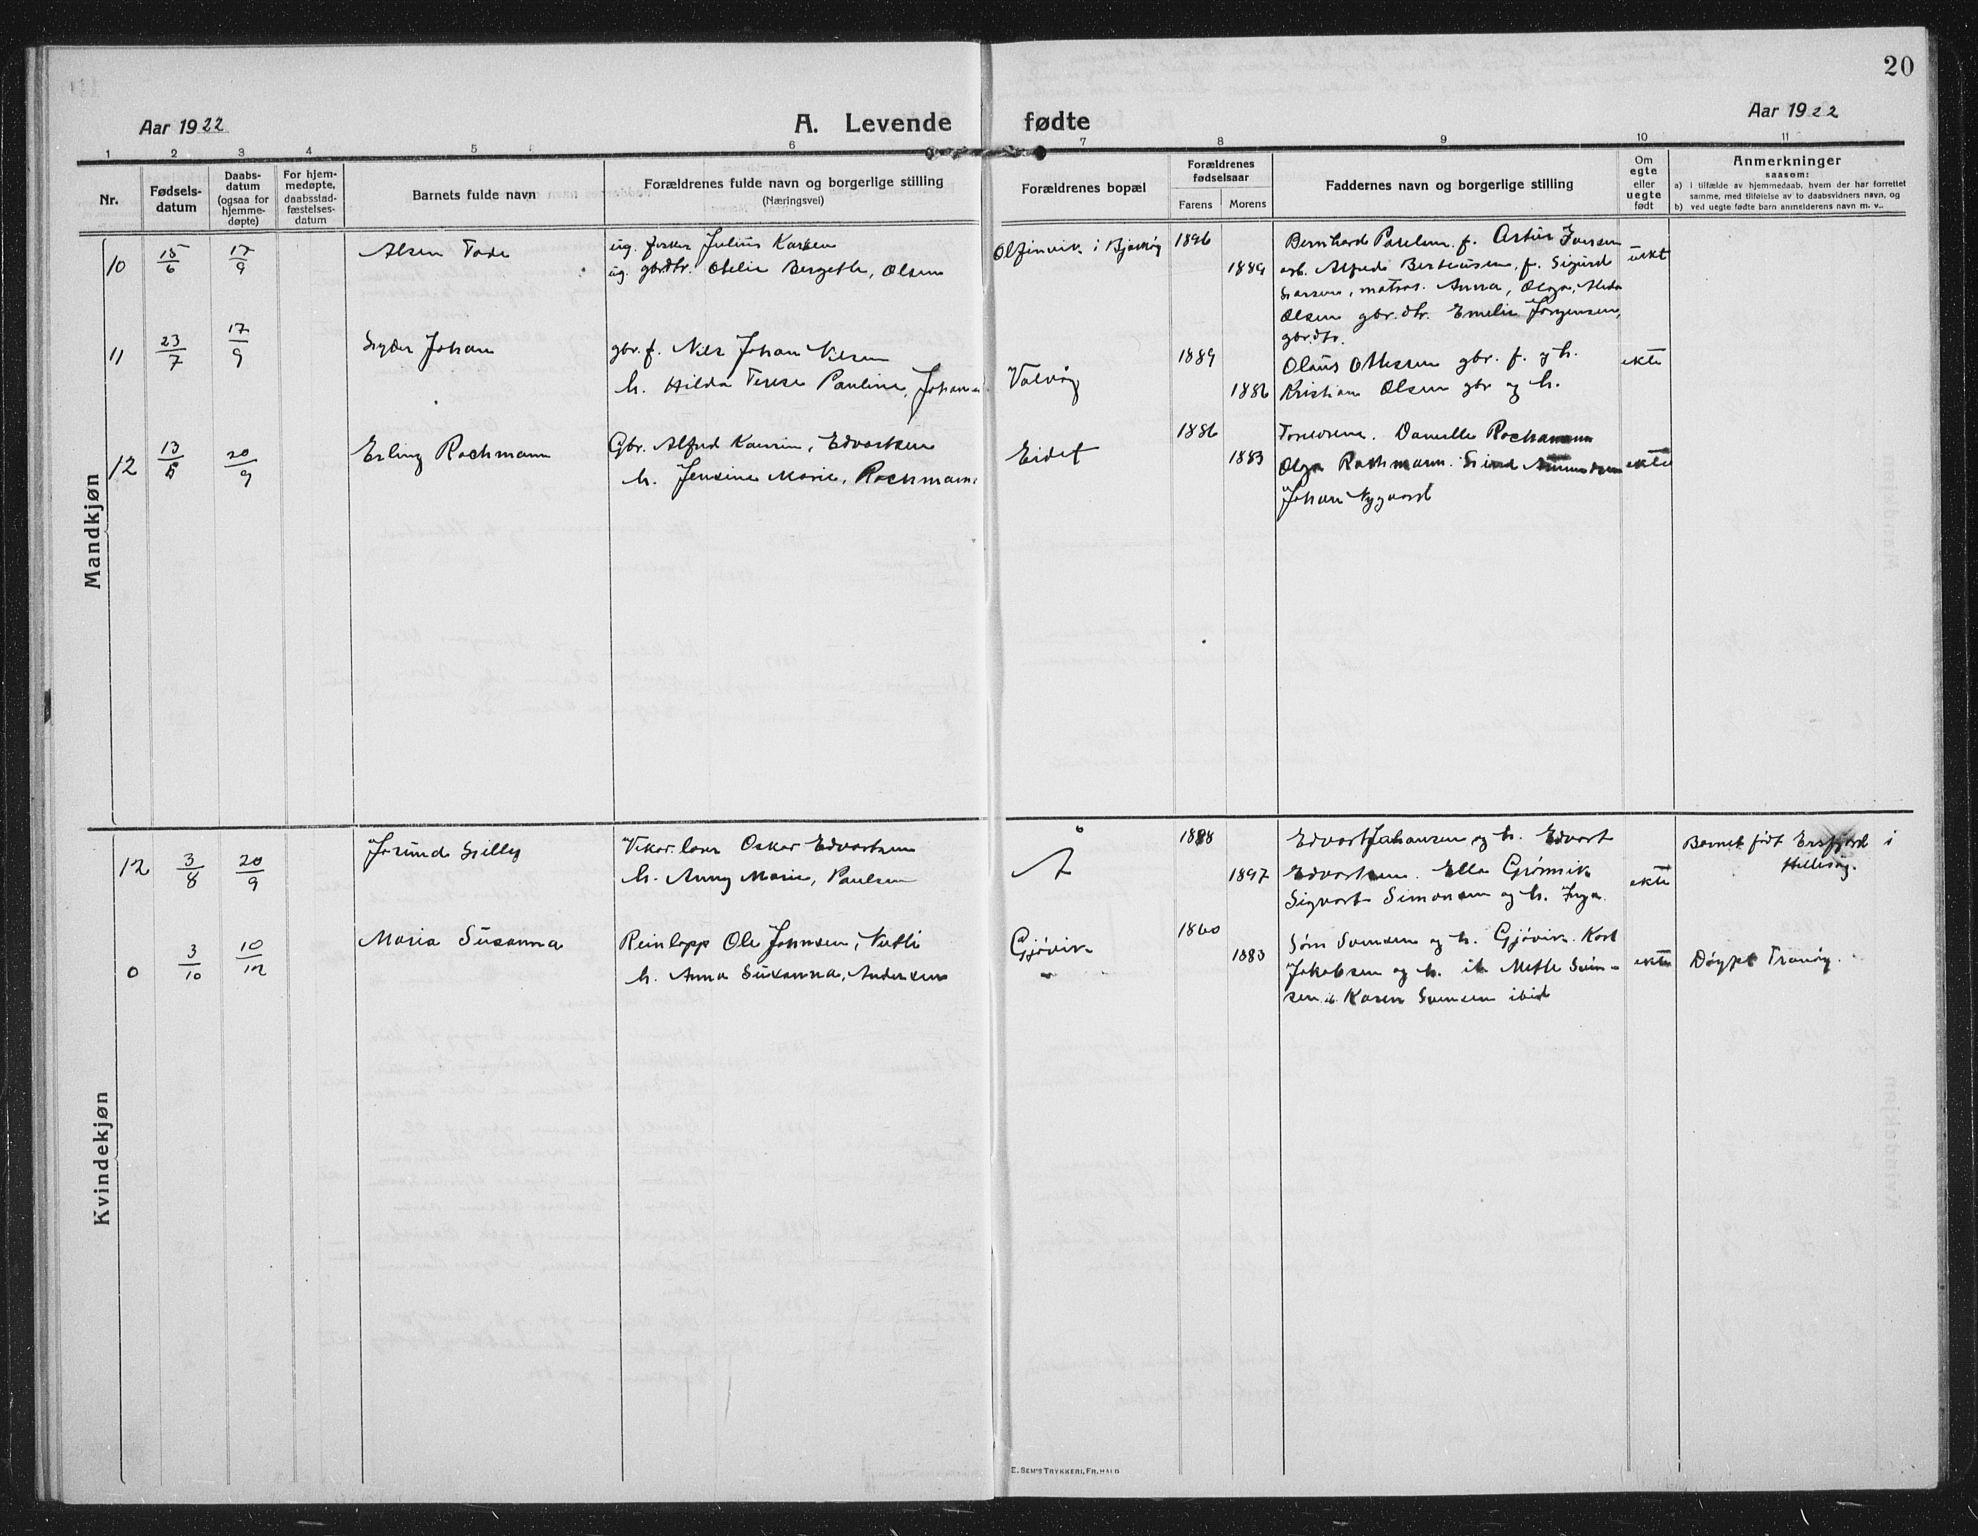 SATØ, Tranøy sokneprestkontor, I/Ia/Iab/L0019klokker: Klokkerbok nr. 19, 1914-1940, s. 20